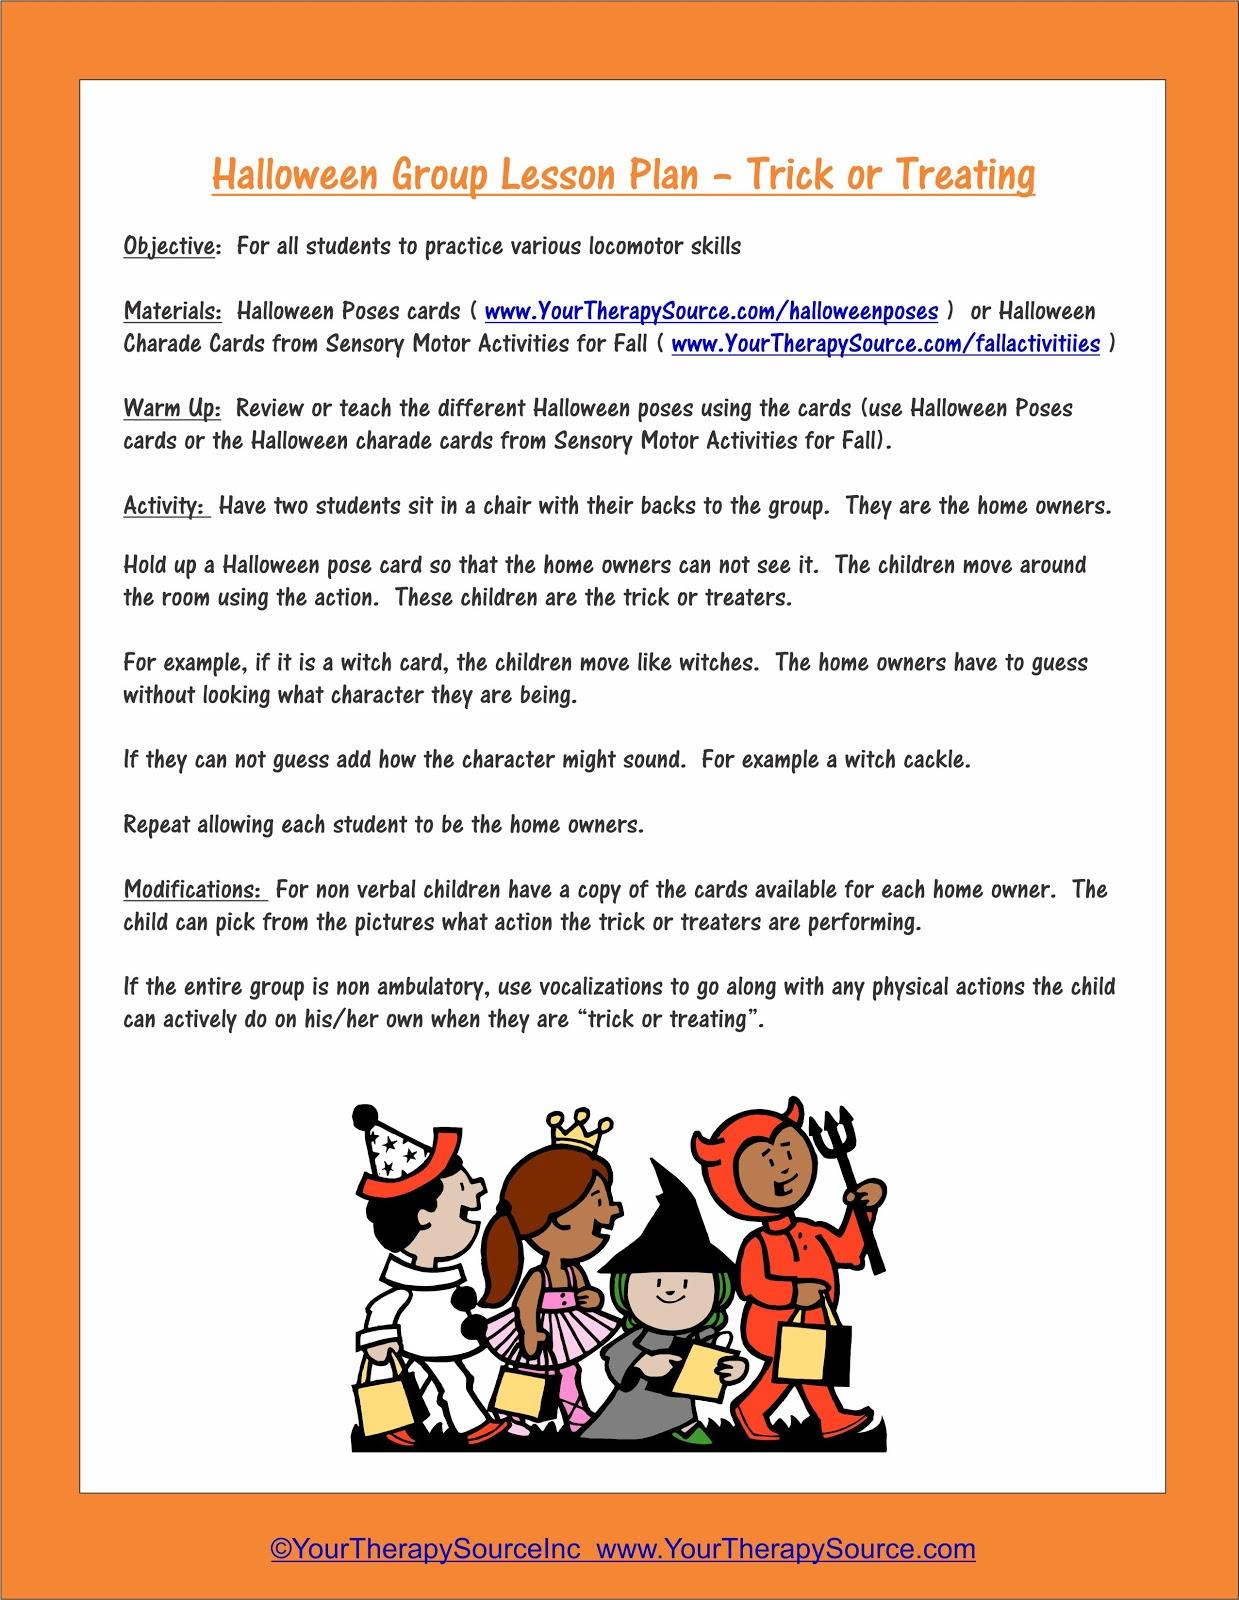 Halloween Sensory Motor Group Game